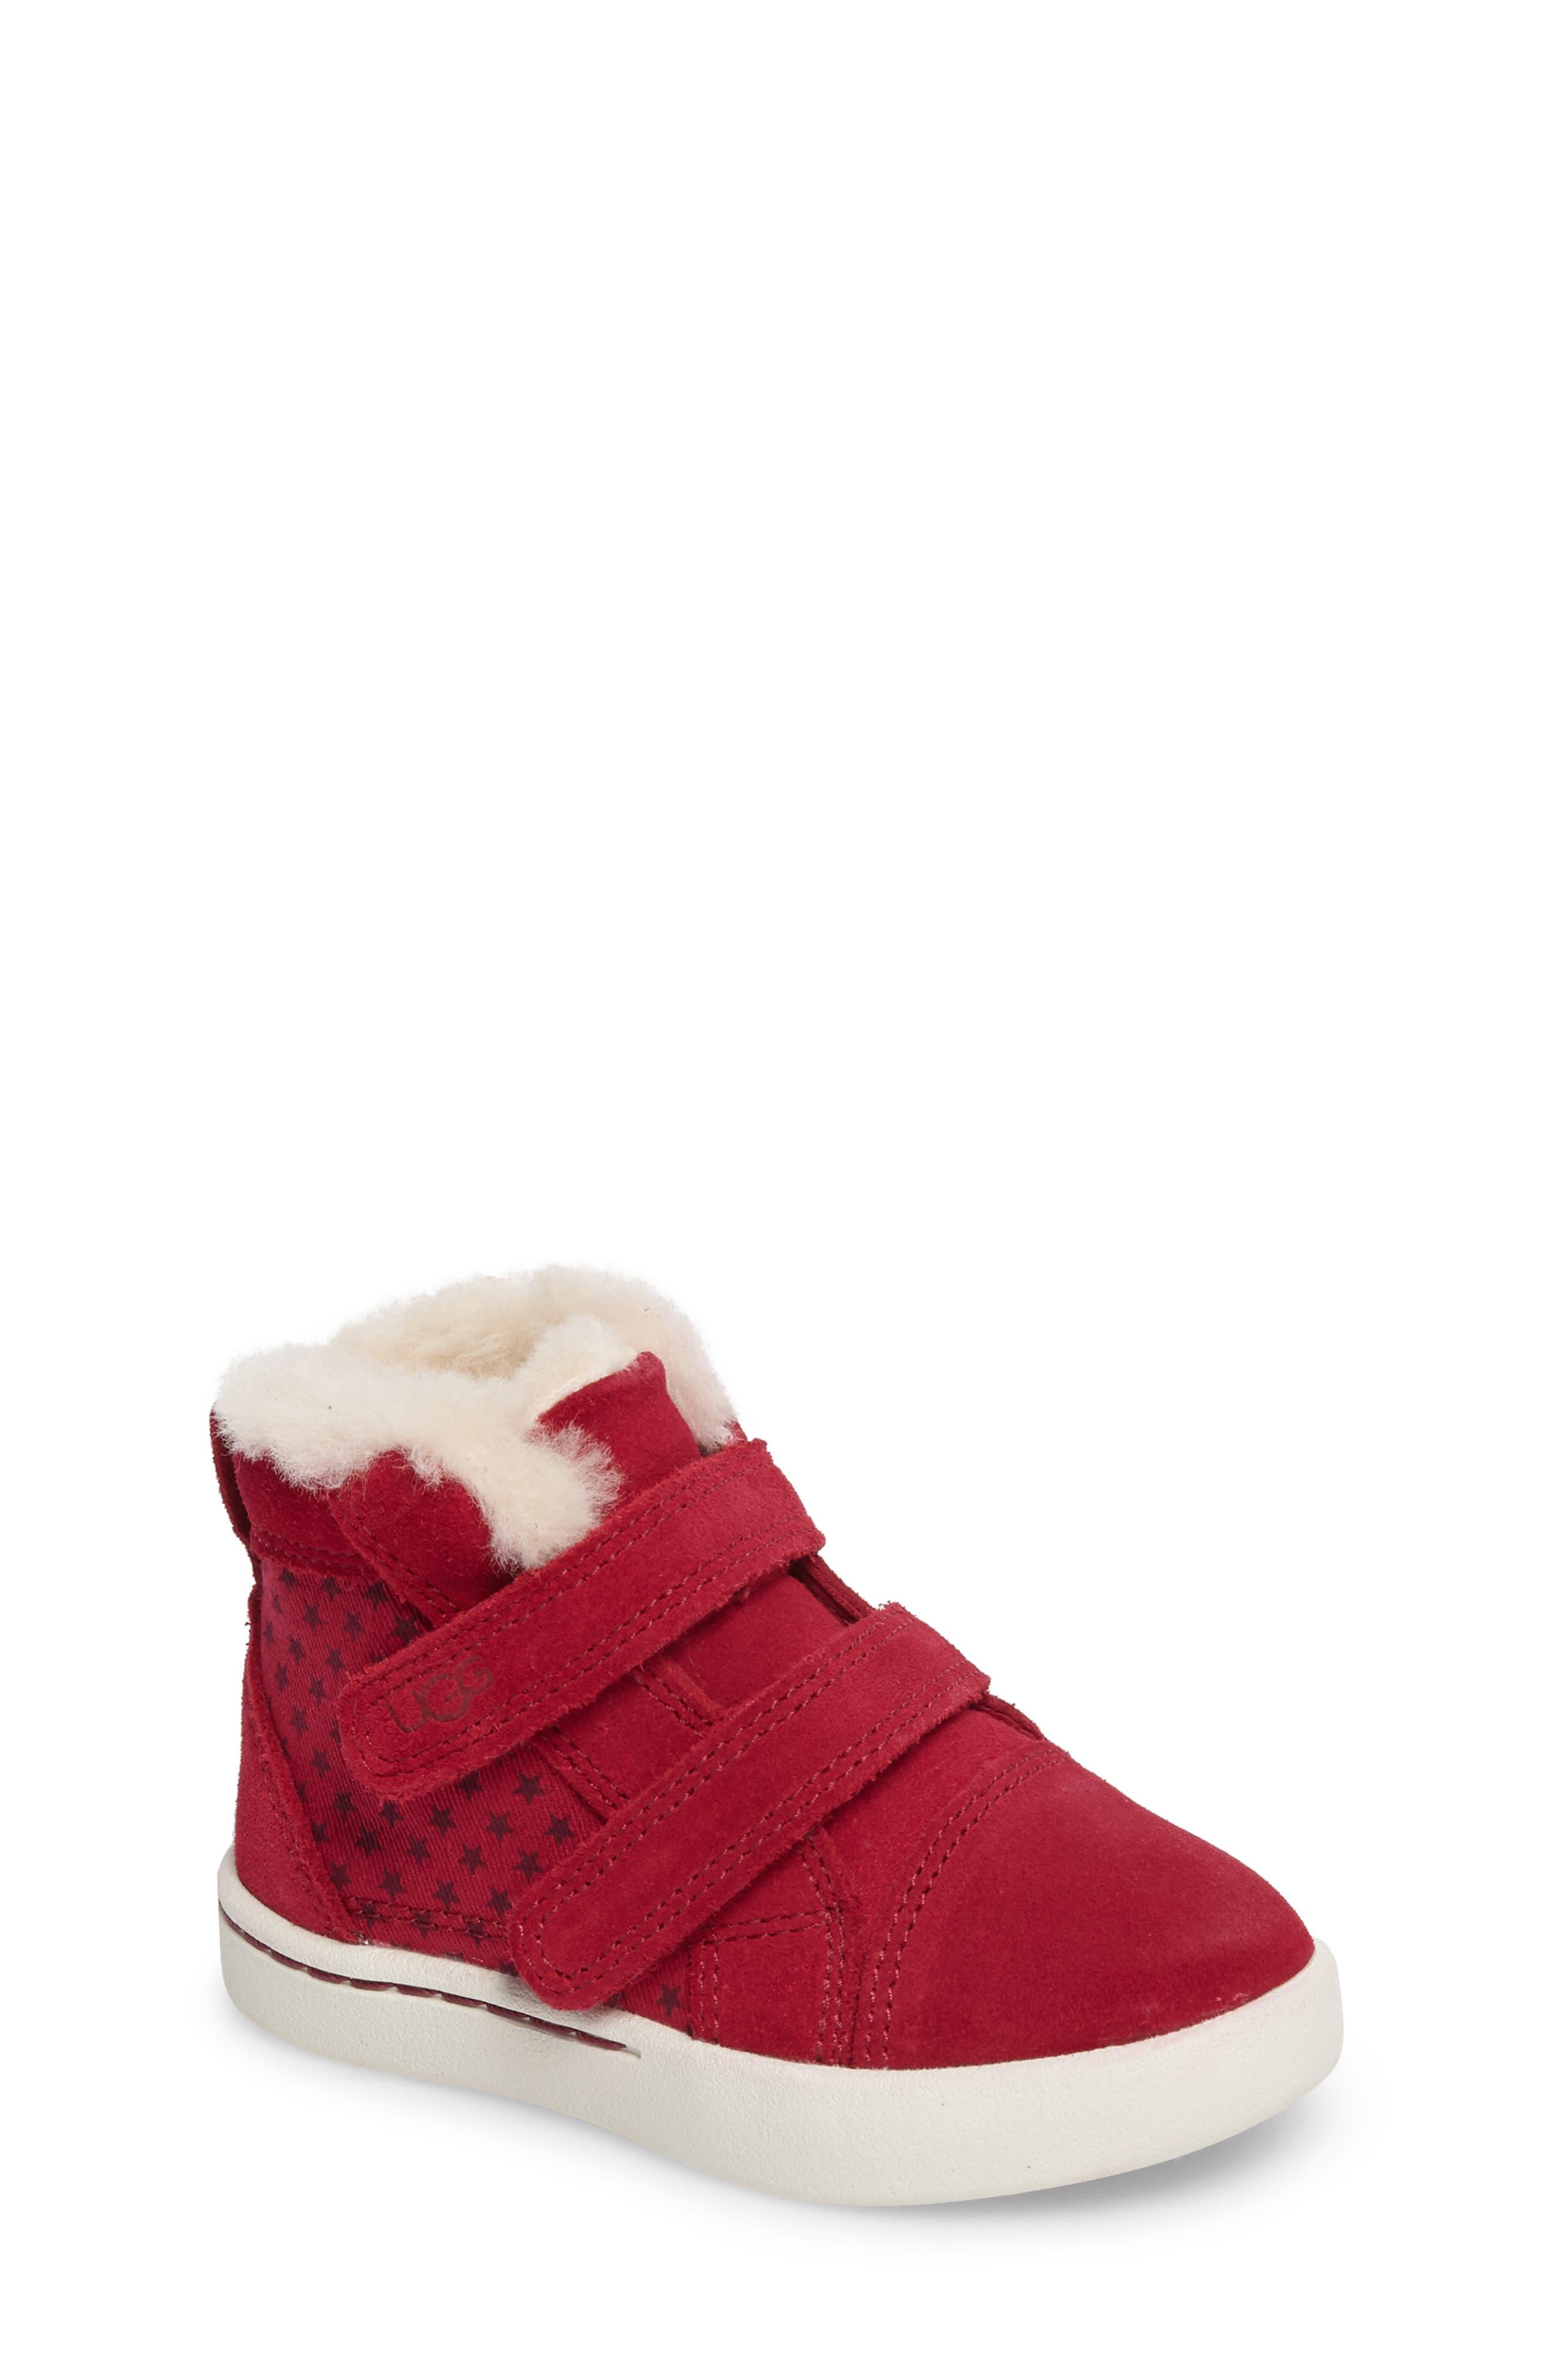 Rennon Stars High Top Sneaker,                             Main thumbnail 1, color,                             650